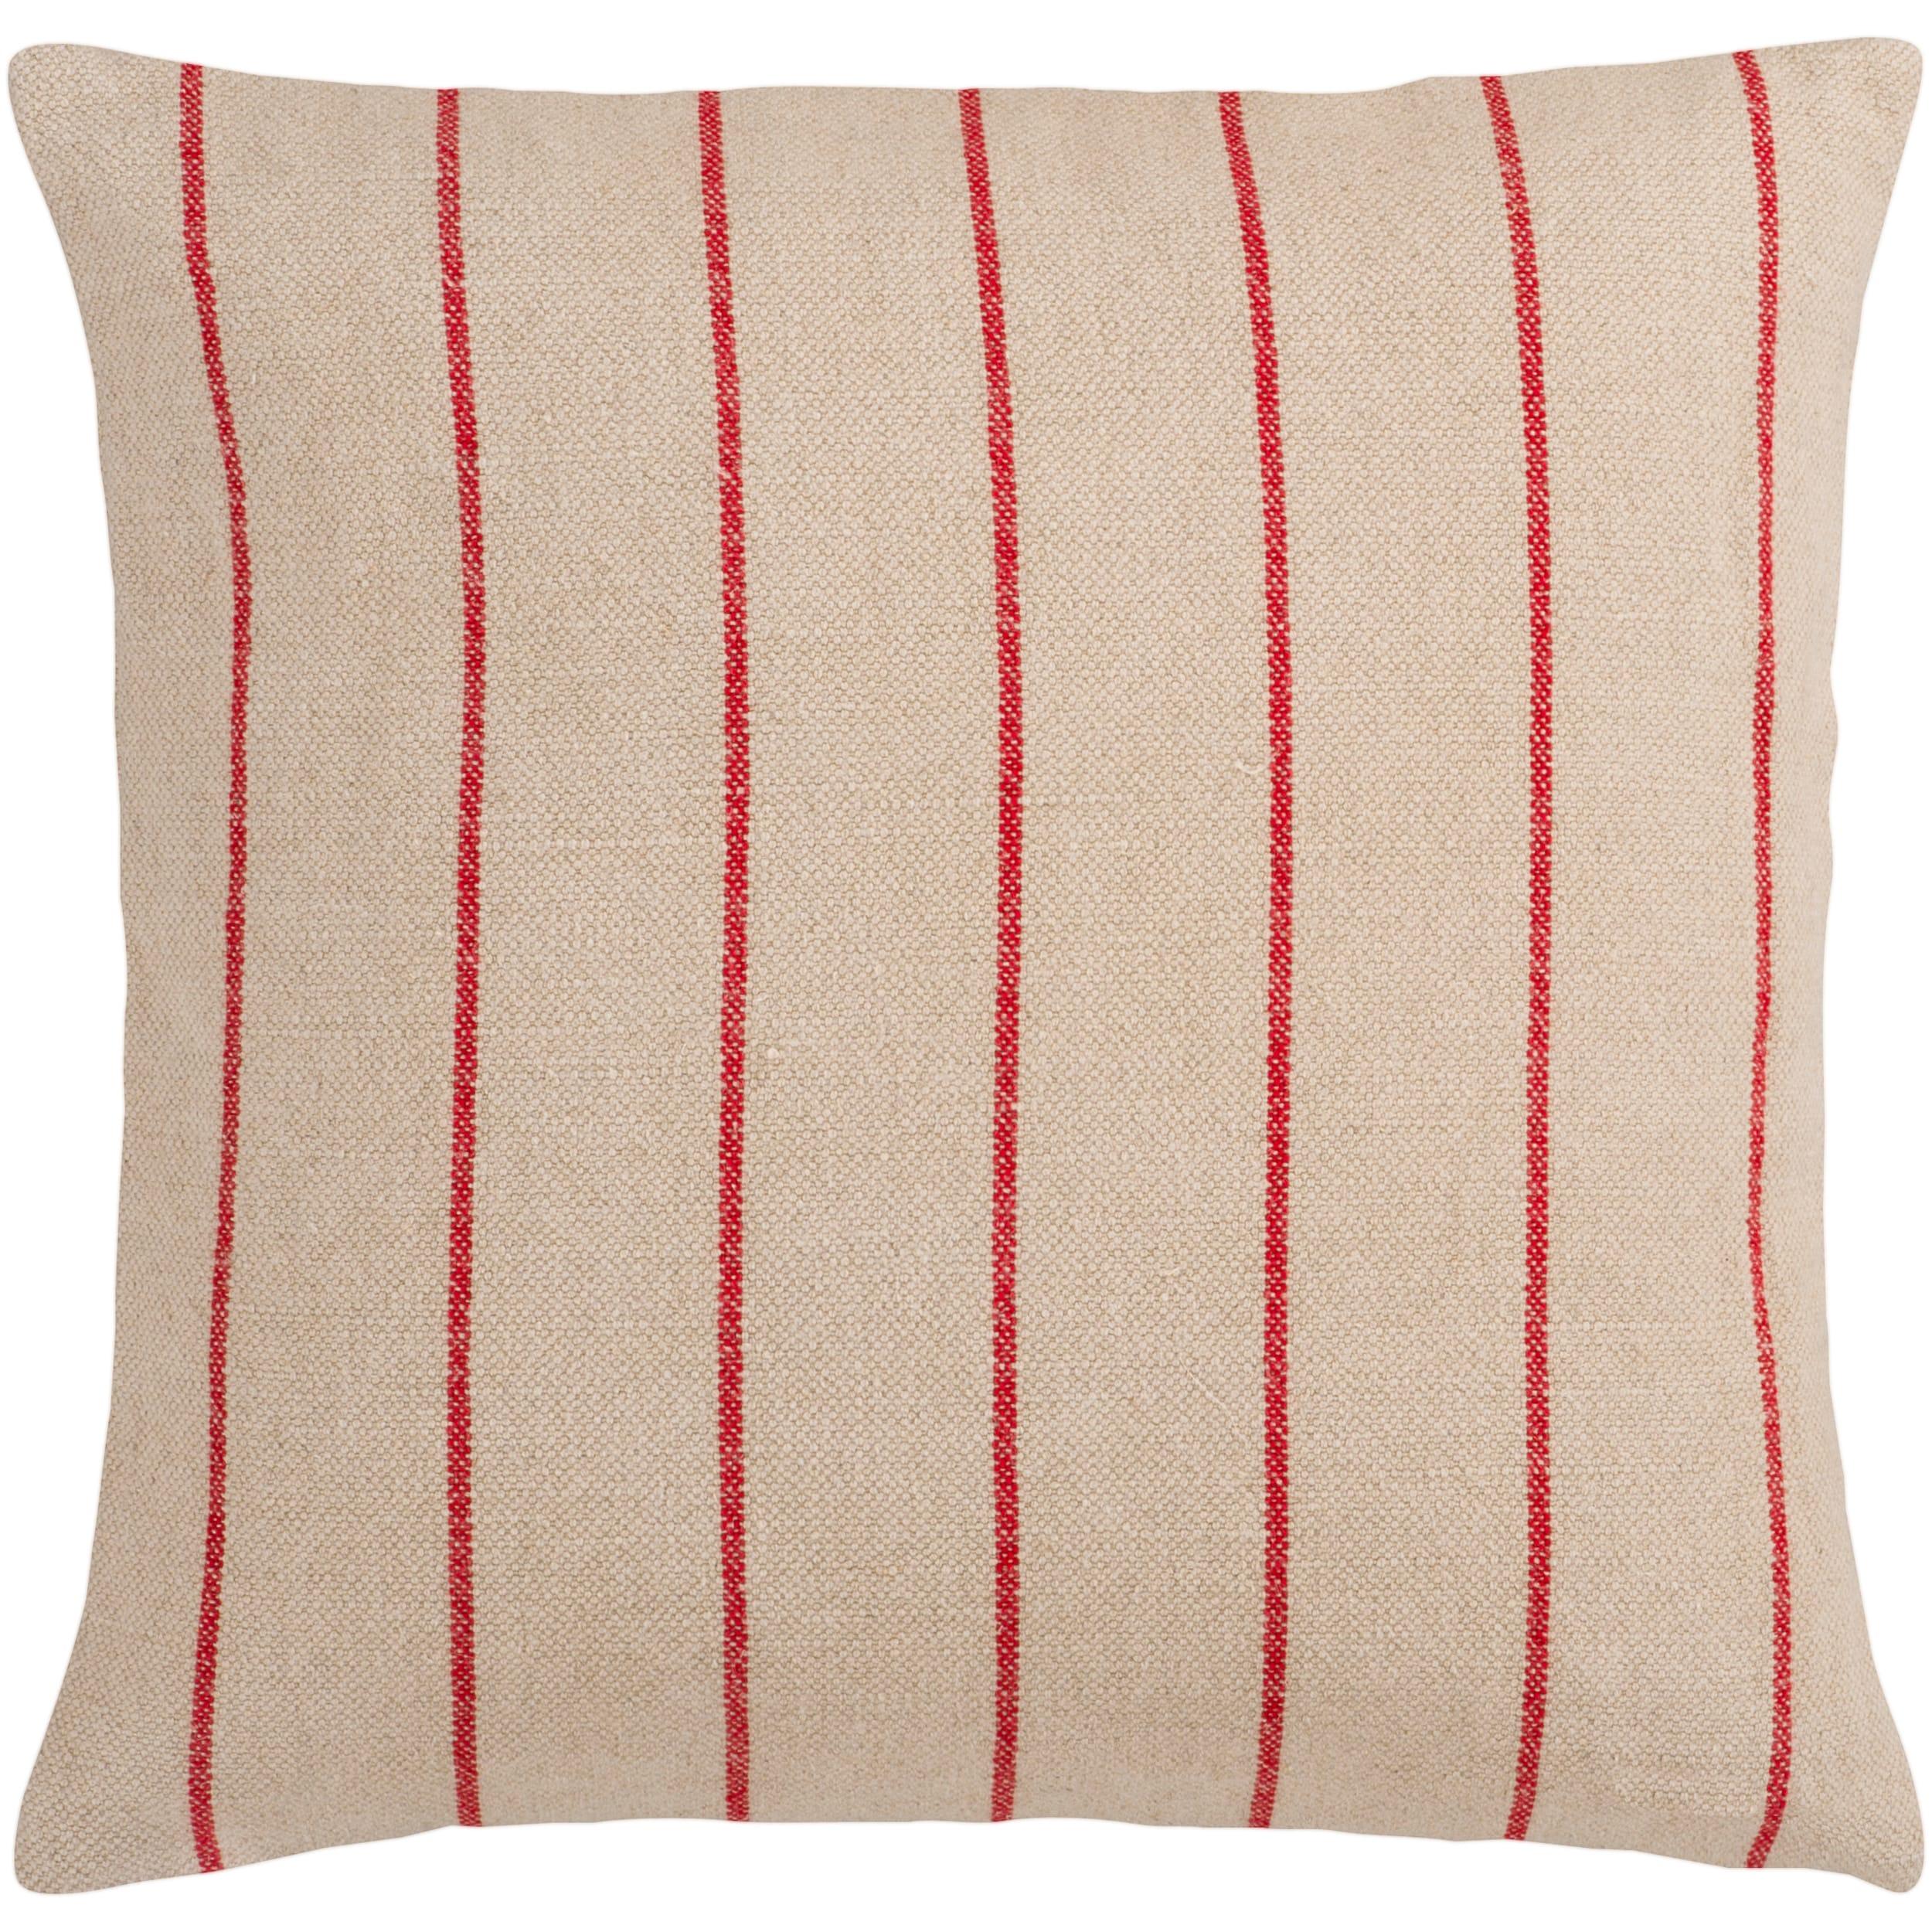 Decorative Liber 22-inch Down Pillow